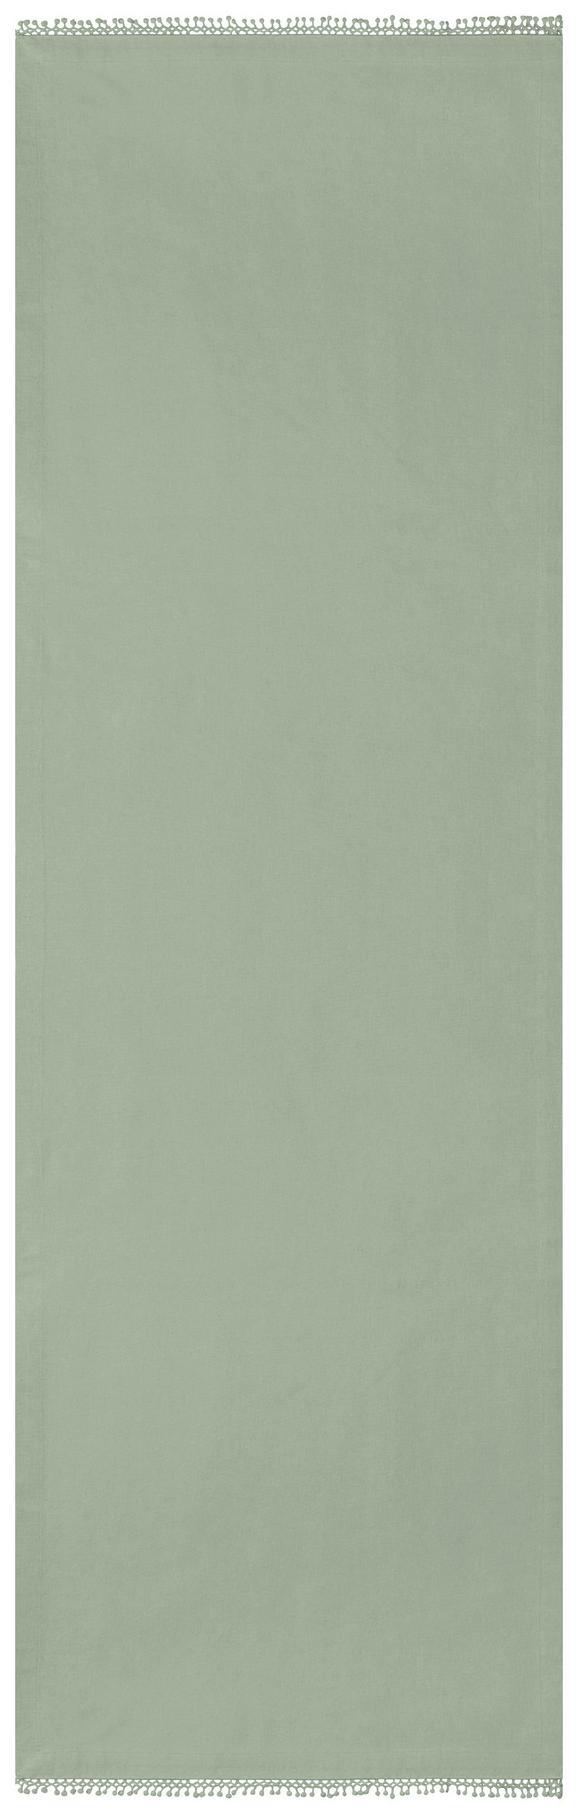 Tischläufer Josefine Grün 45x150cm - Grün, ROMANTIK / LANDHAUS, Textil (45/150cm) - Mömax modern living